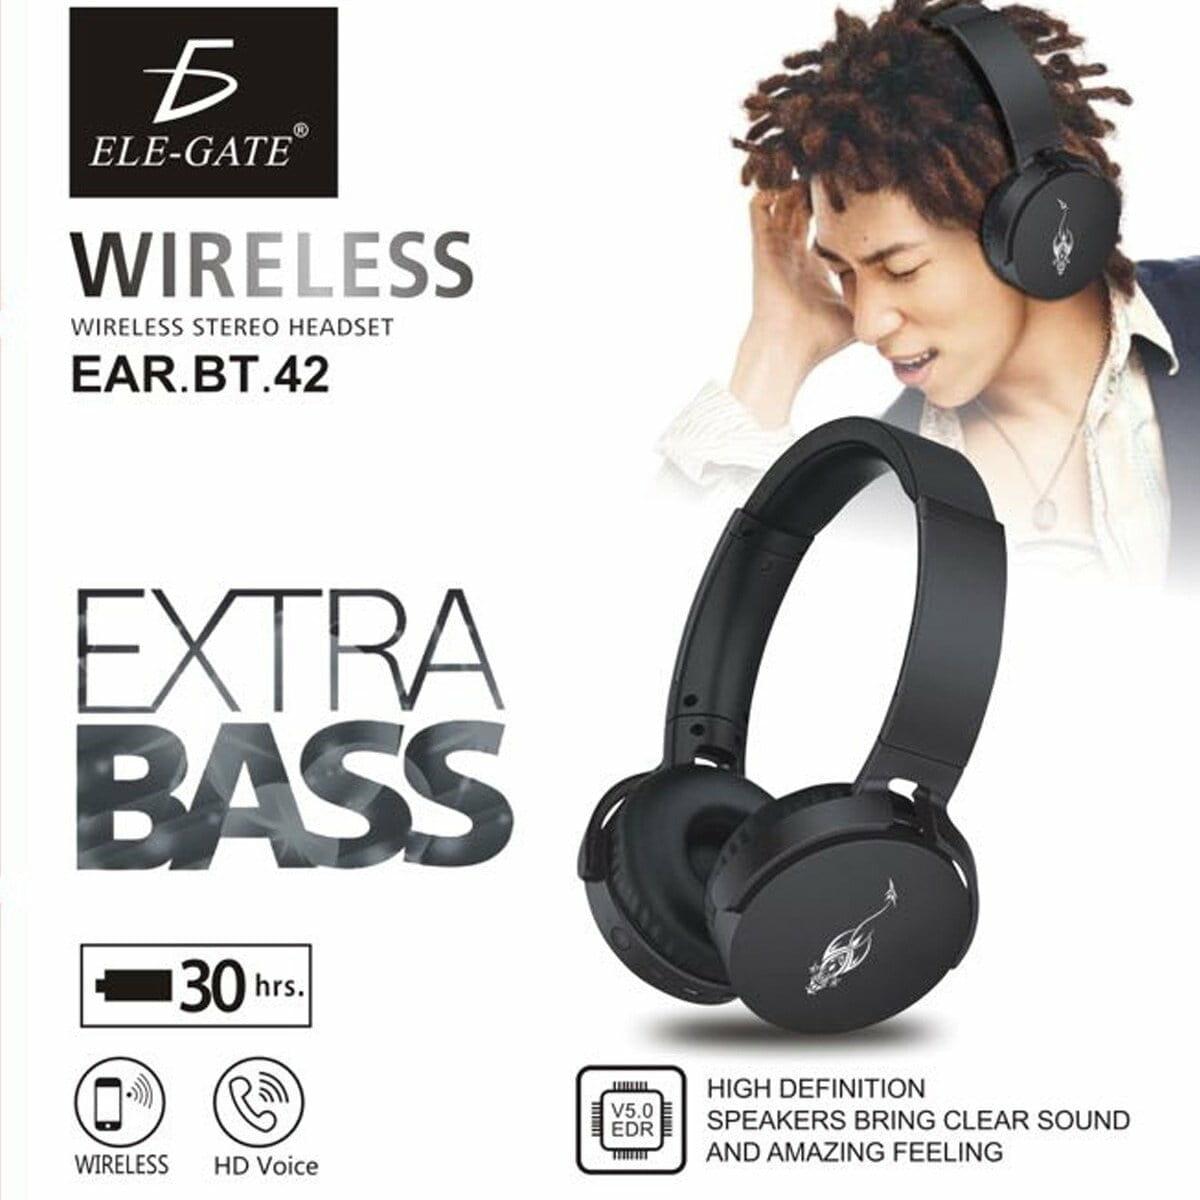 Audifonos earbt42